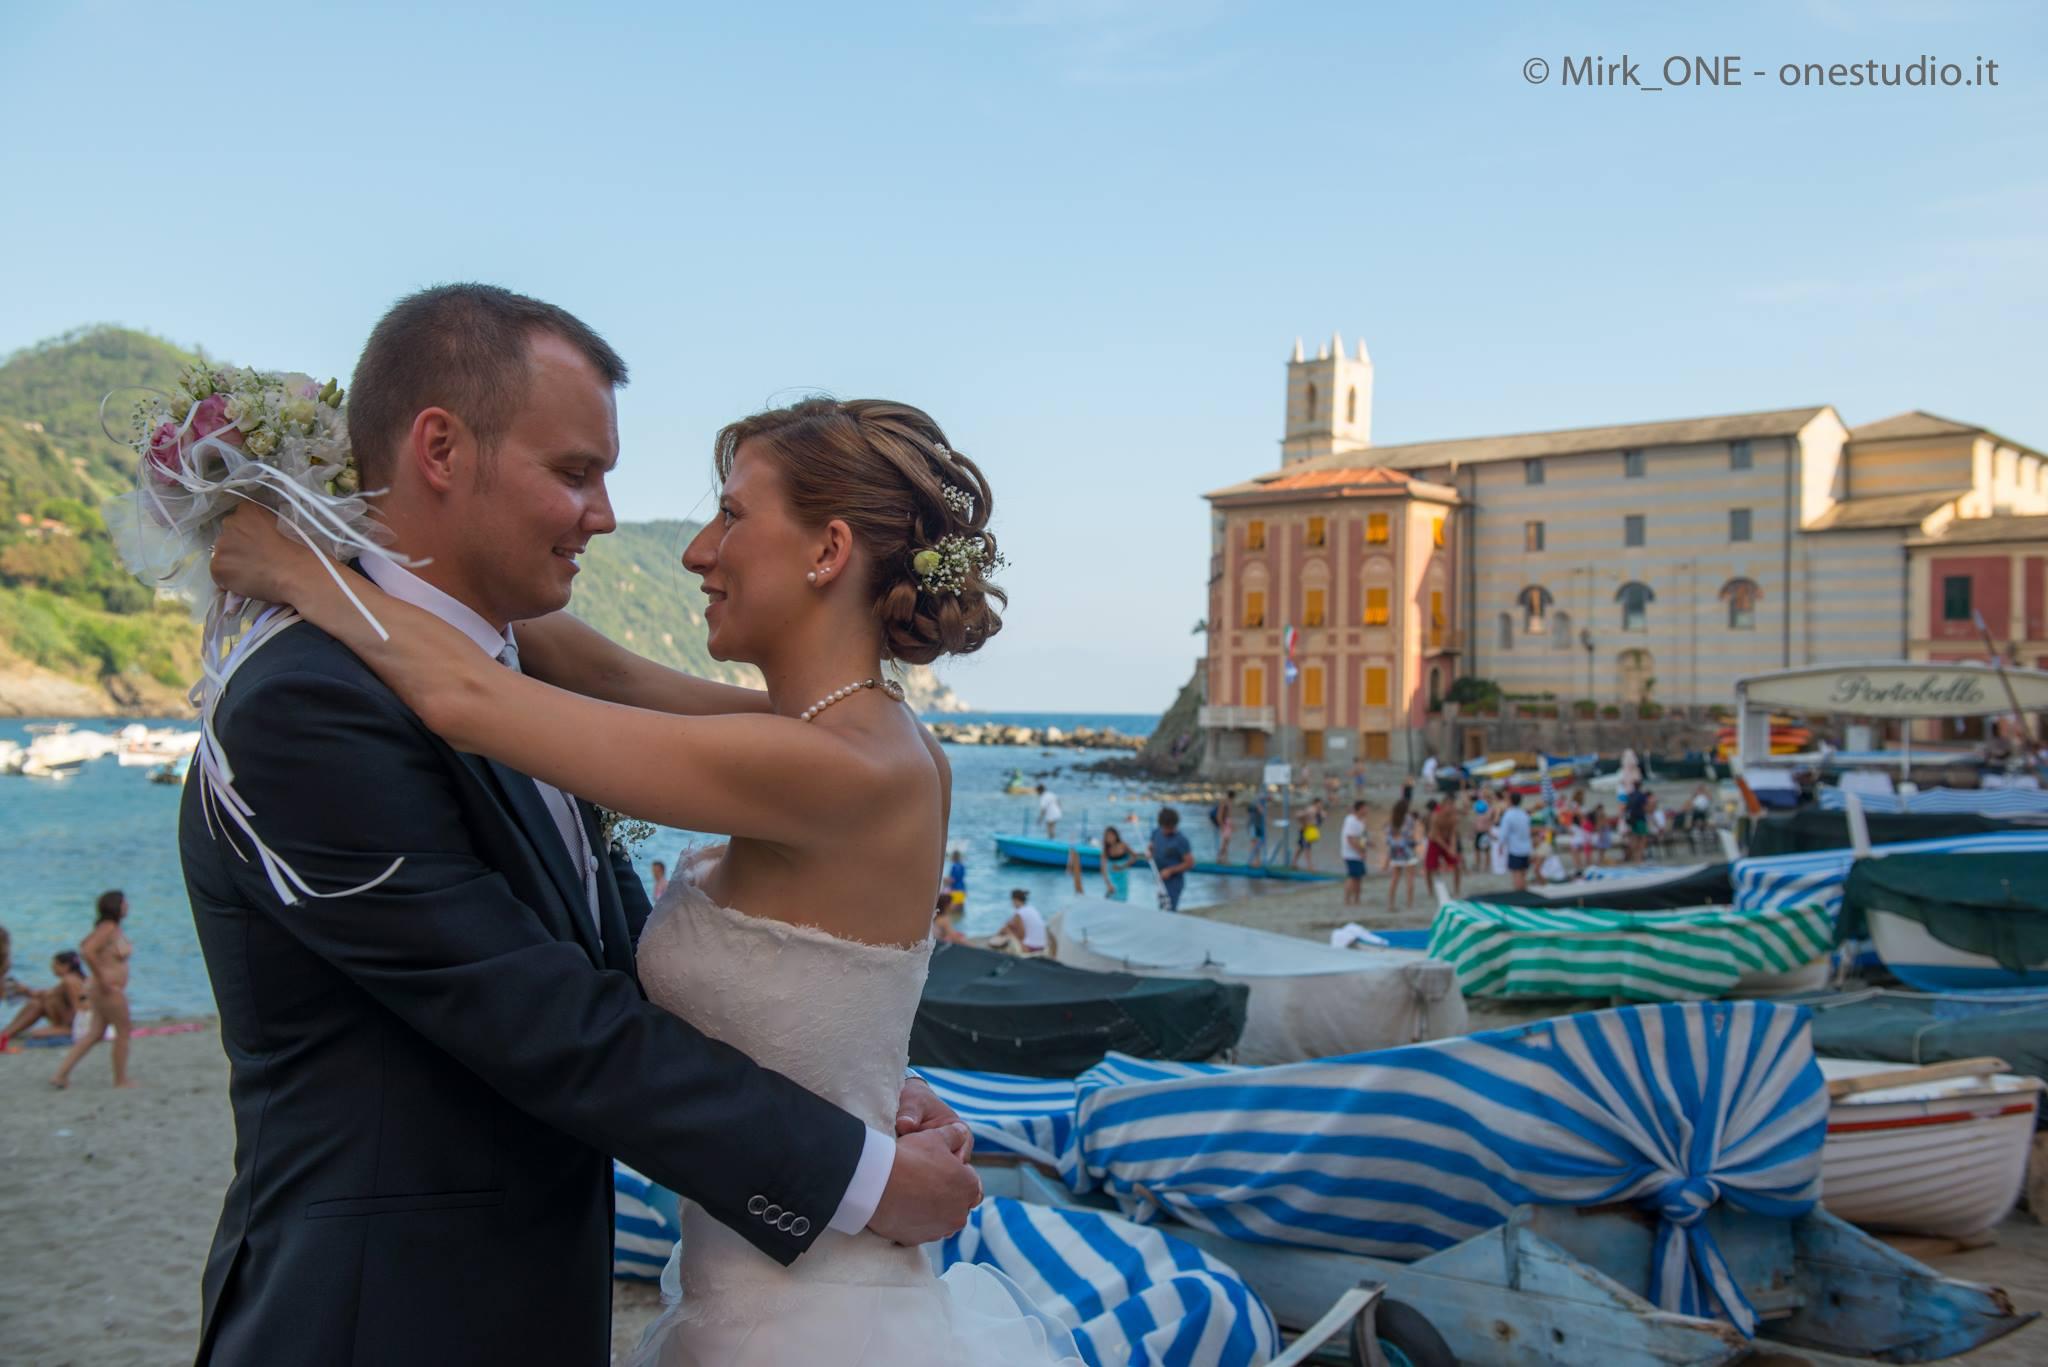 https://lnx.mirkone.it/wp-content/uploads/2015/07/mirk_ONE-fotografo-matrimonio-00834.jpg